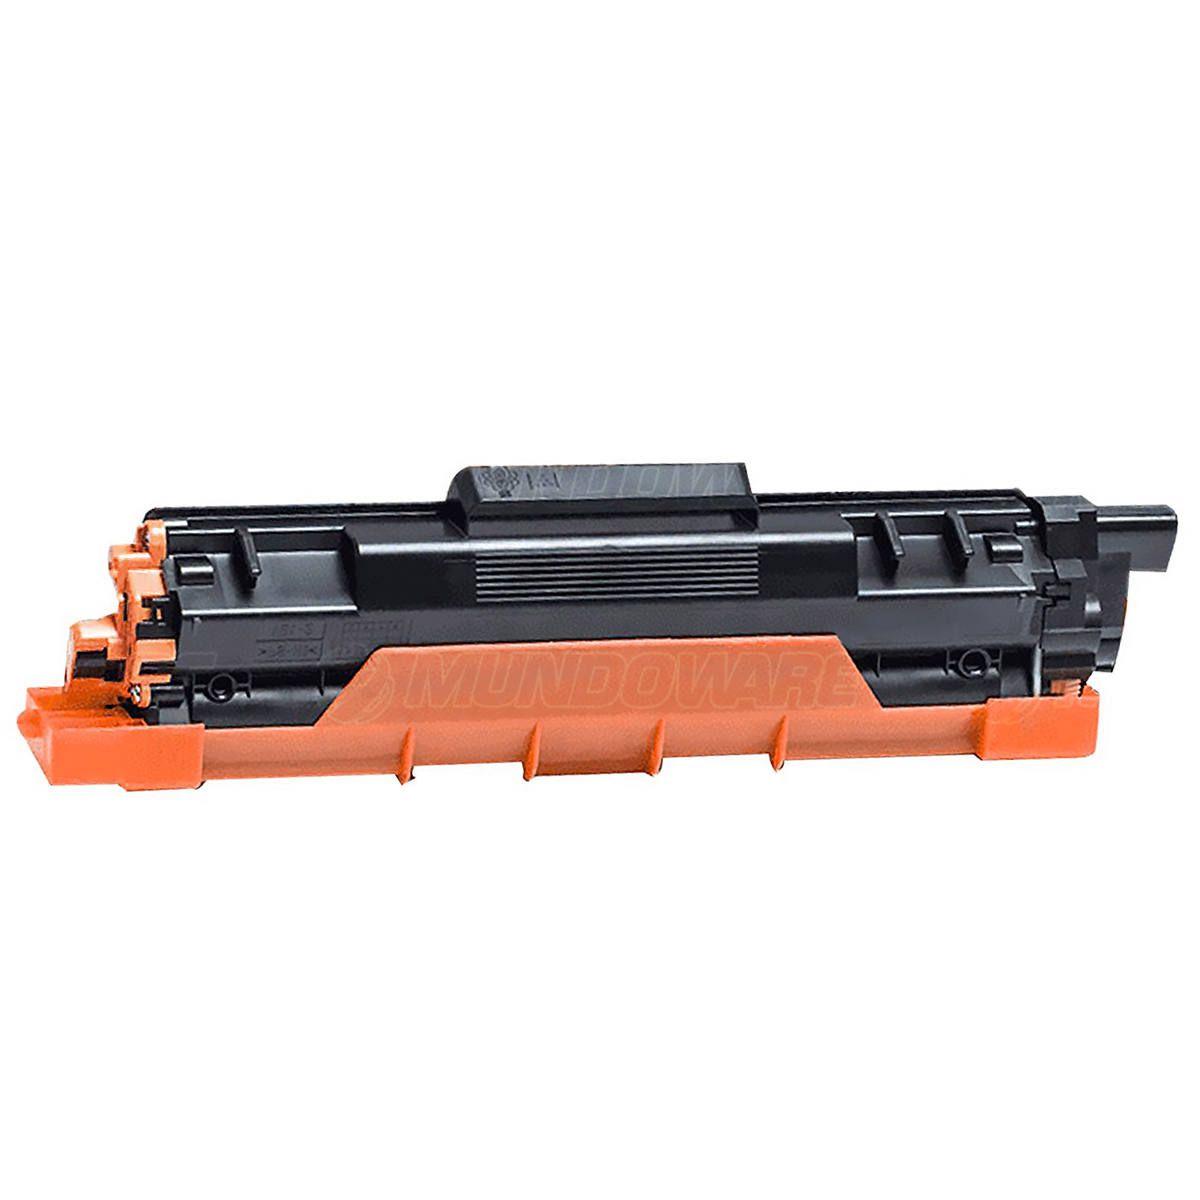 Compatível: Toner TN-217 TN-213 para Brother HL-L3210cw DCP-L3551cdw MFC-L3750cdw L3210 L3710cdw L3750 / Ciano / 2.300